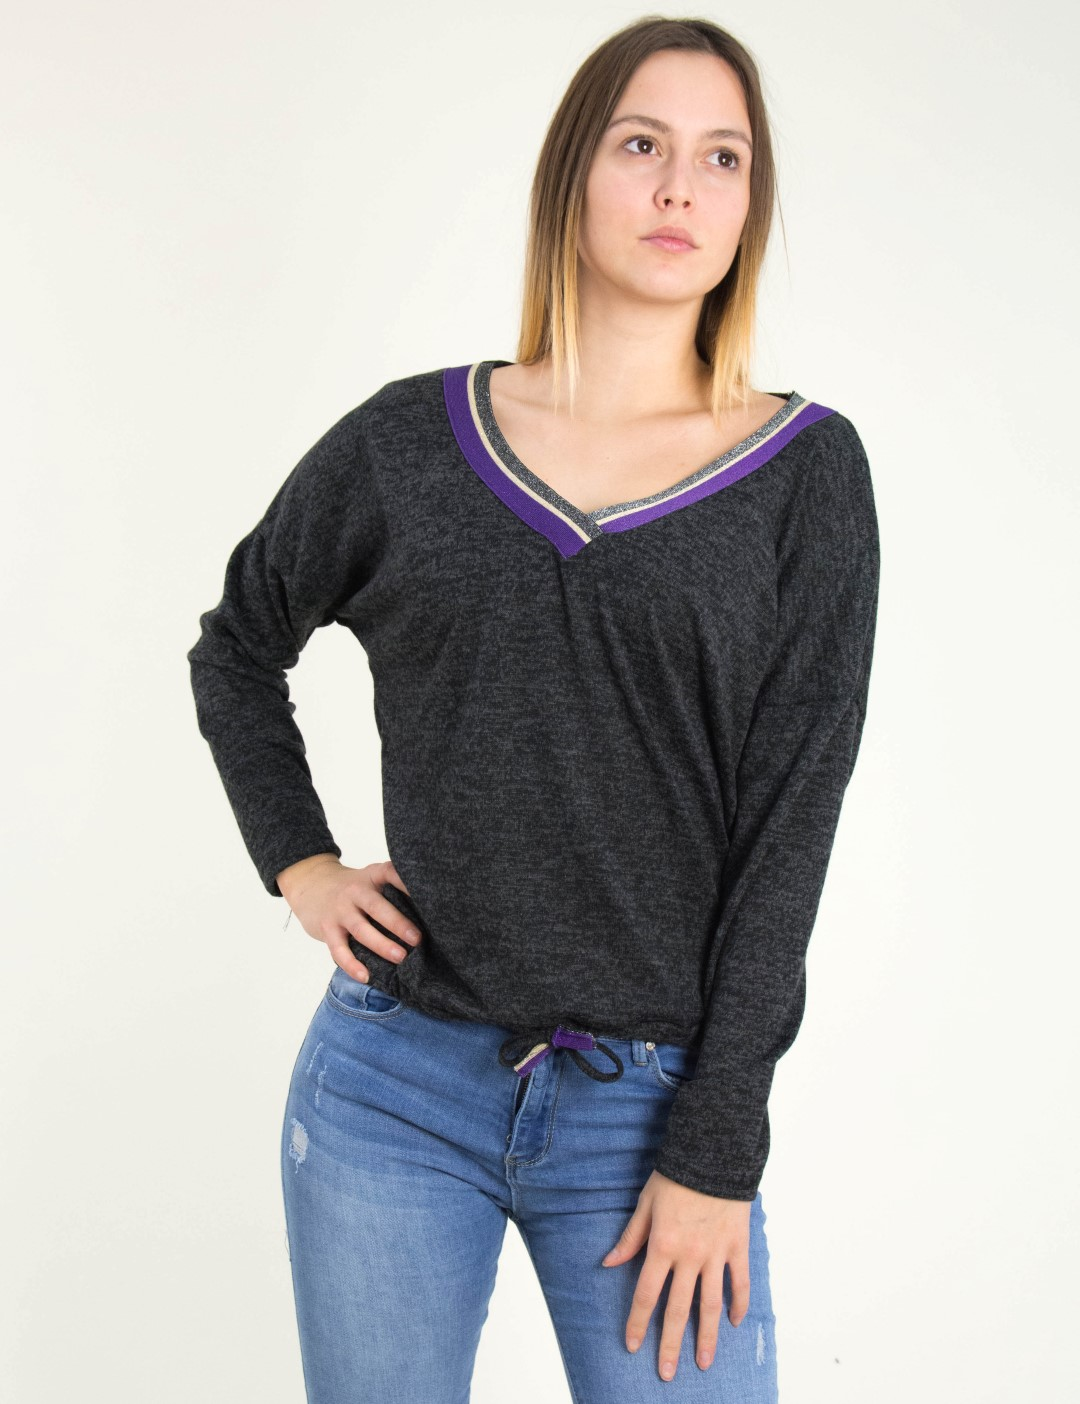 a66158c688b9 Γυναικεία ανθρακί μακρυμάνικη μπλούζα Ve Benissimo 39479X